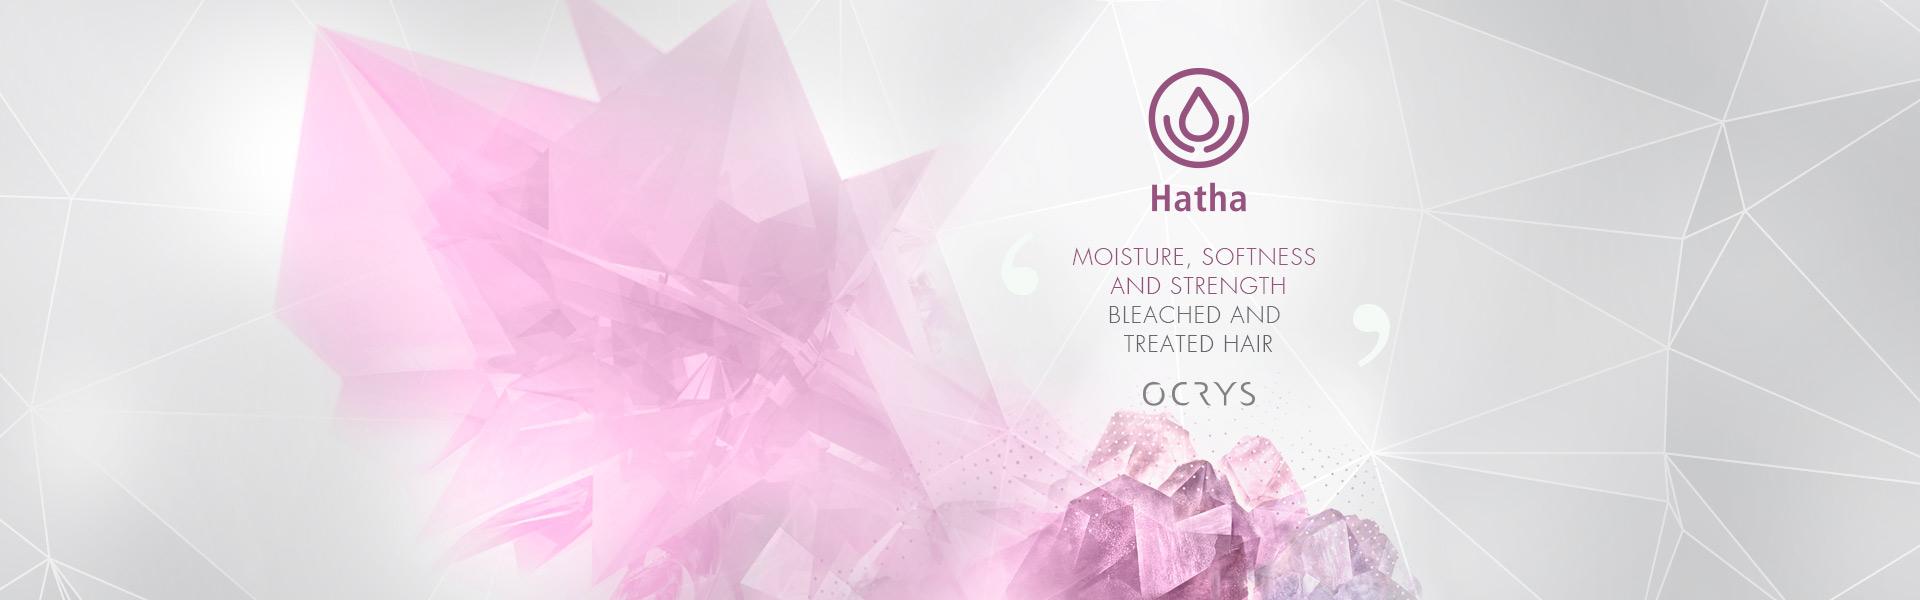 banner_centrali_OCRYS_HATHA